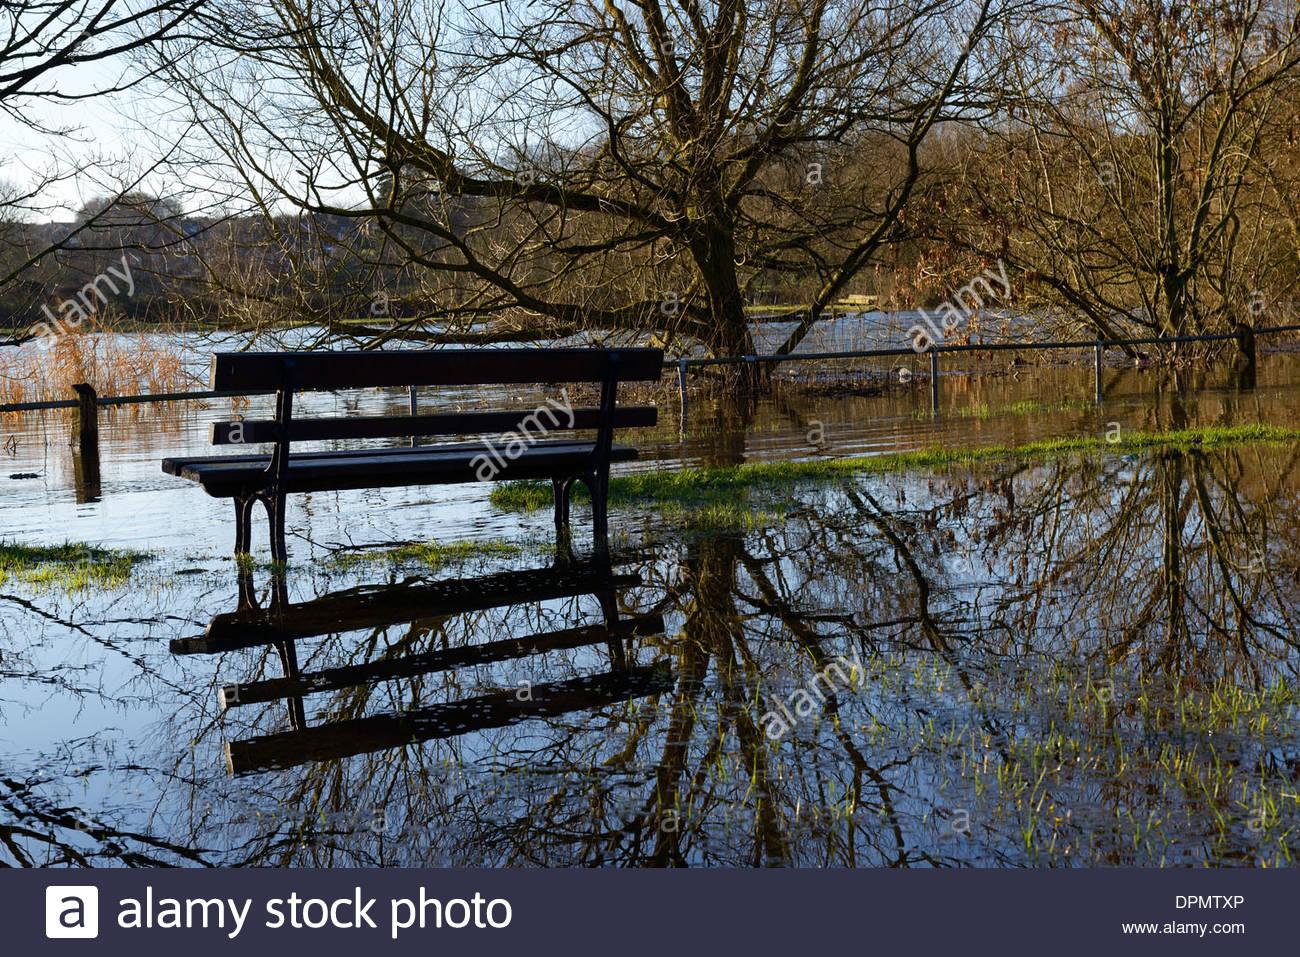 River Avon floods Churchill Gardens, Salisbury, Wiltshire, England, UK Stock Photo